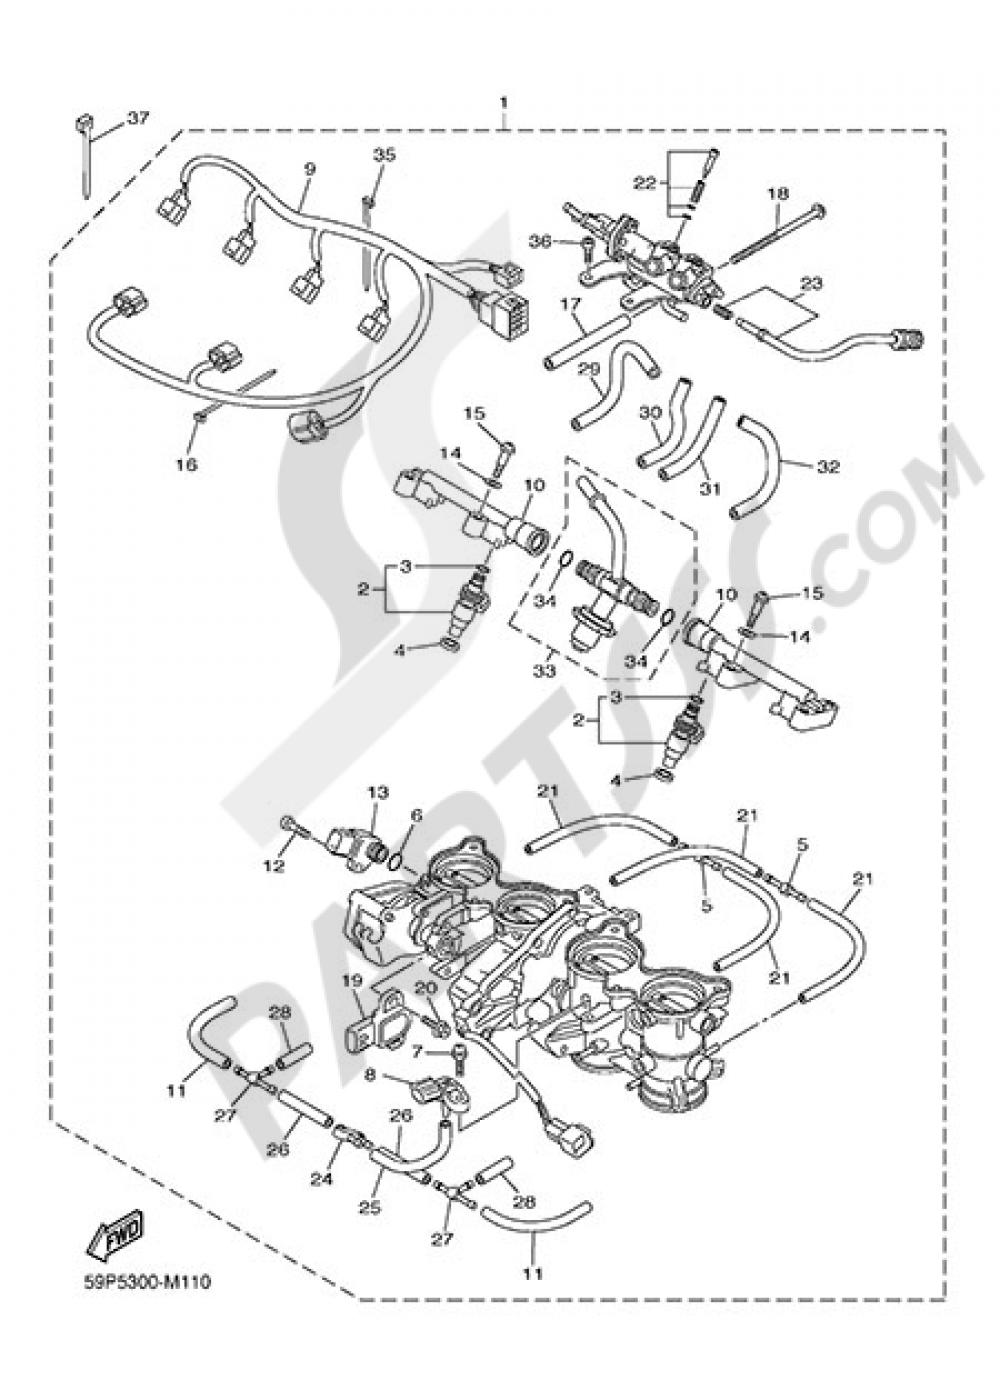 INTAKE 2 Yamaha Fazer8 ABS 2014